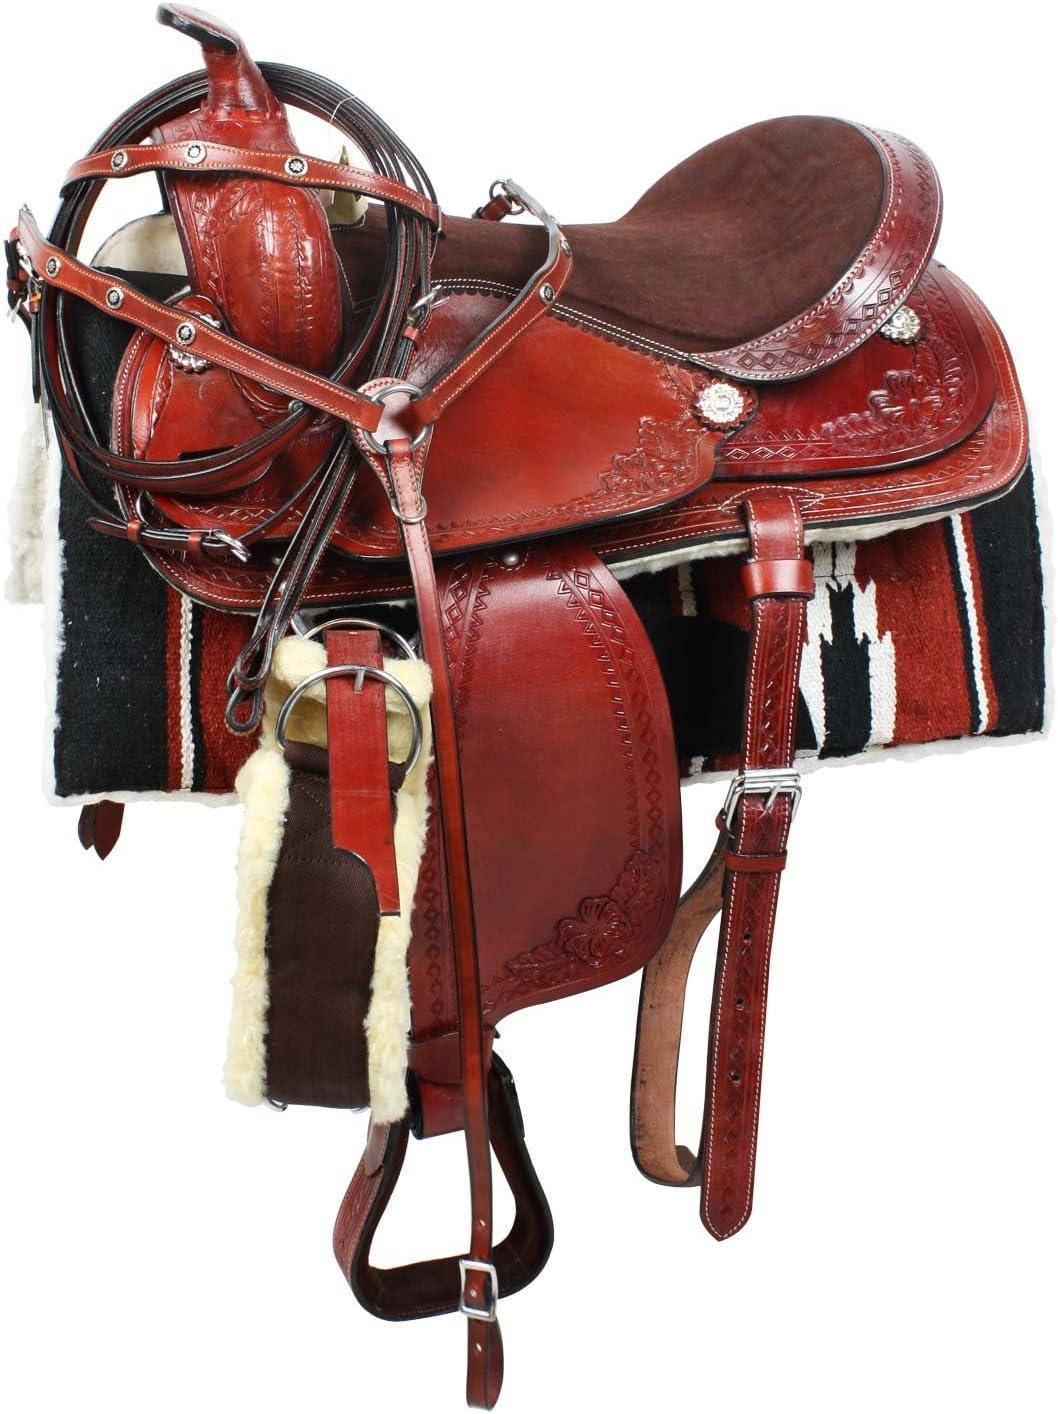 SilverStar sillín Western Amigo Completa